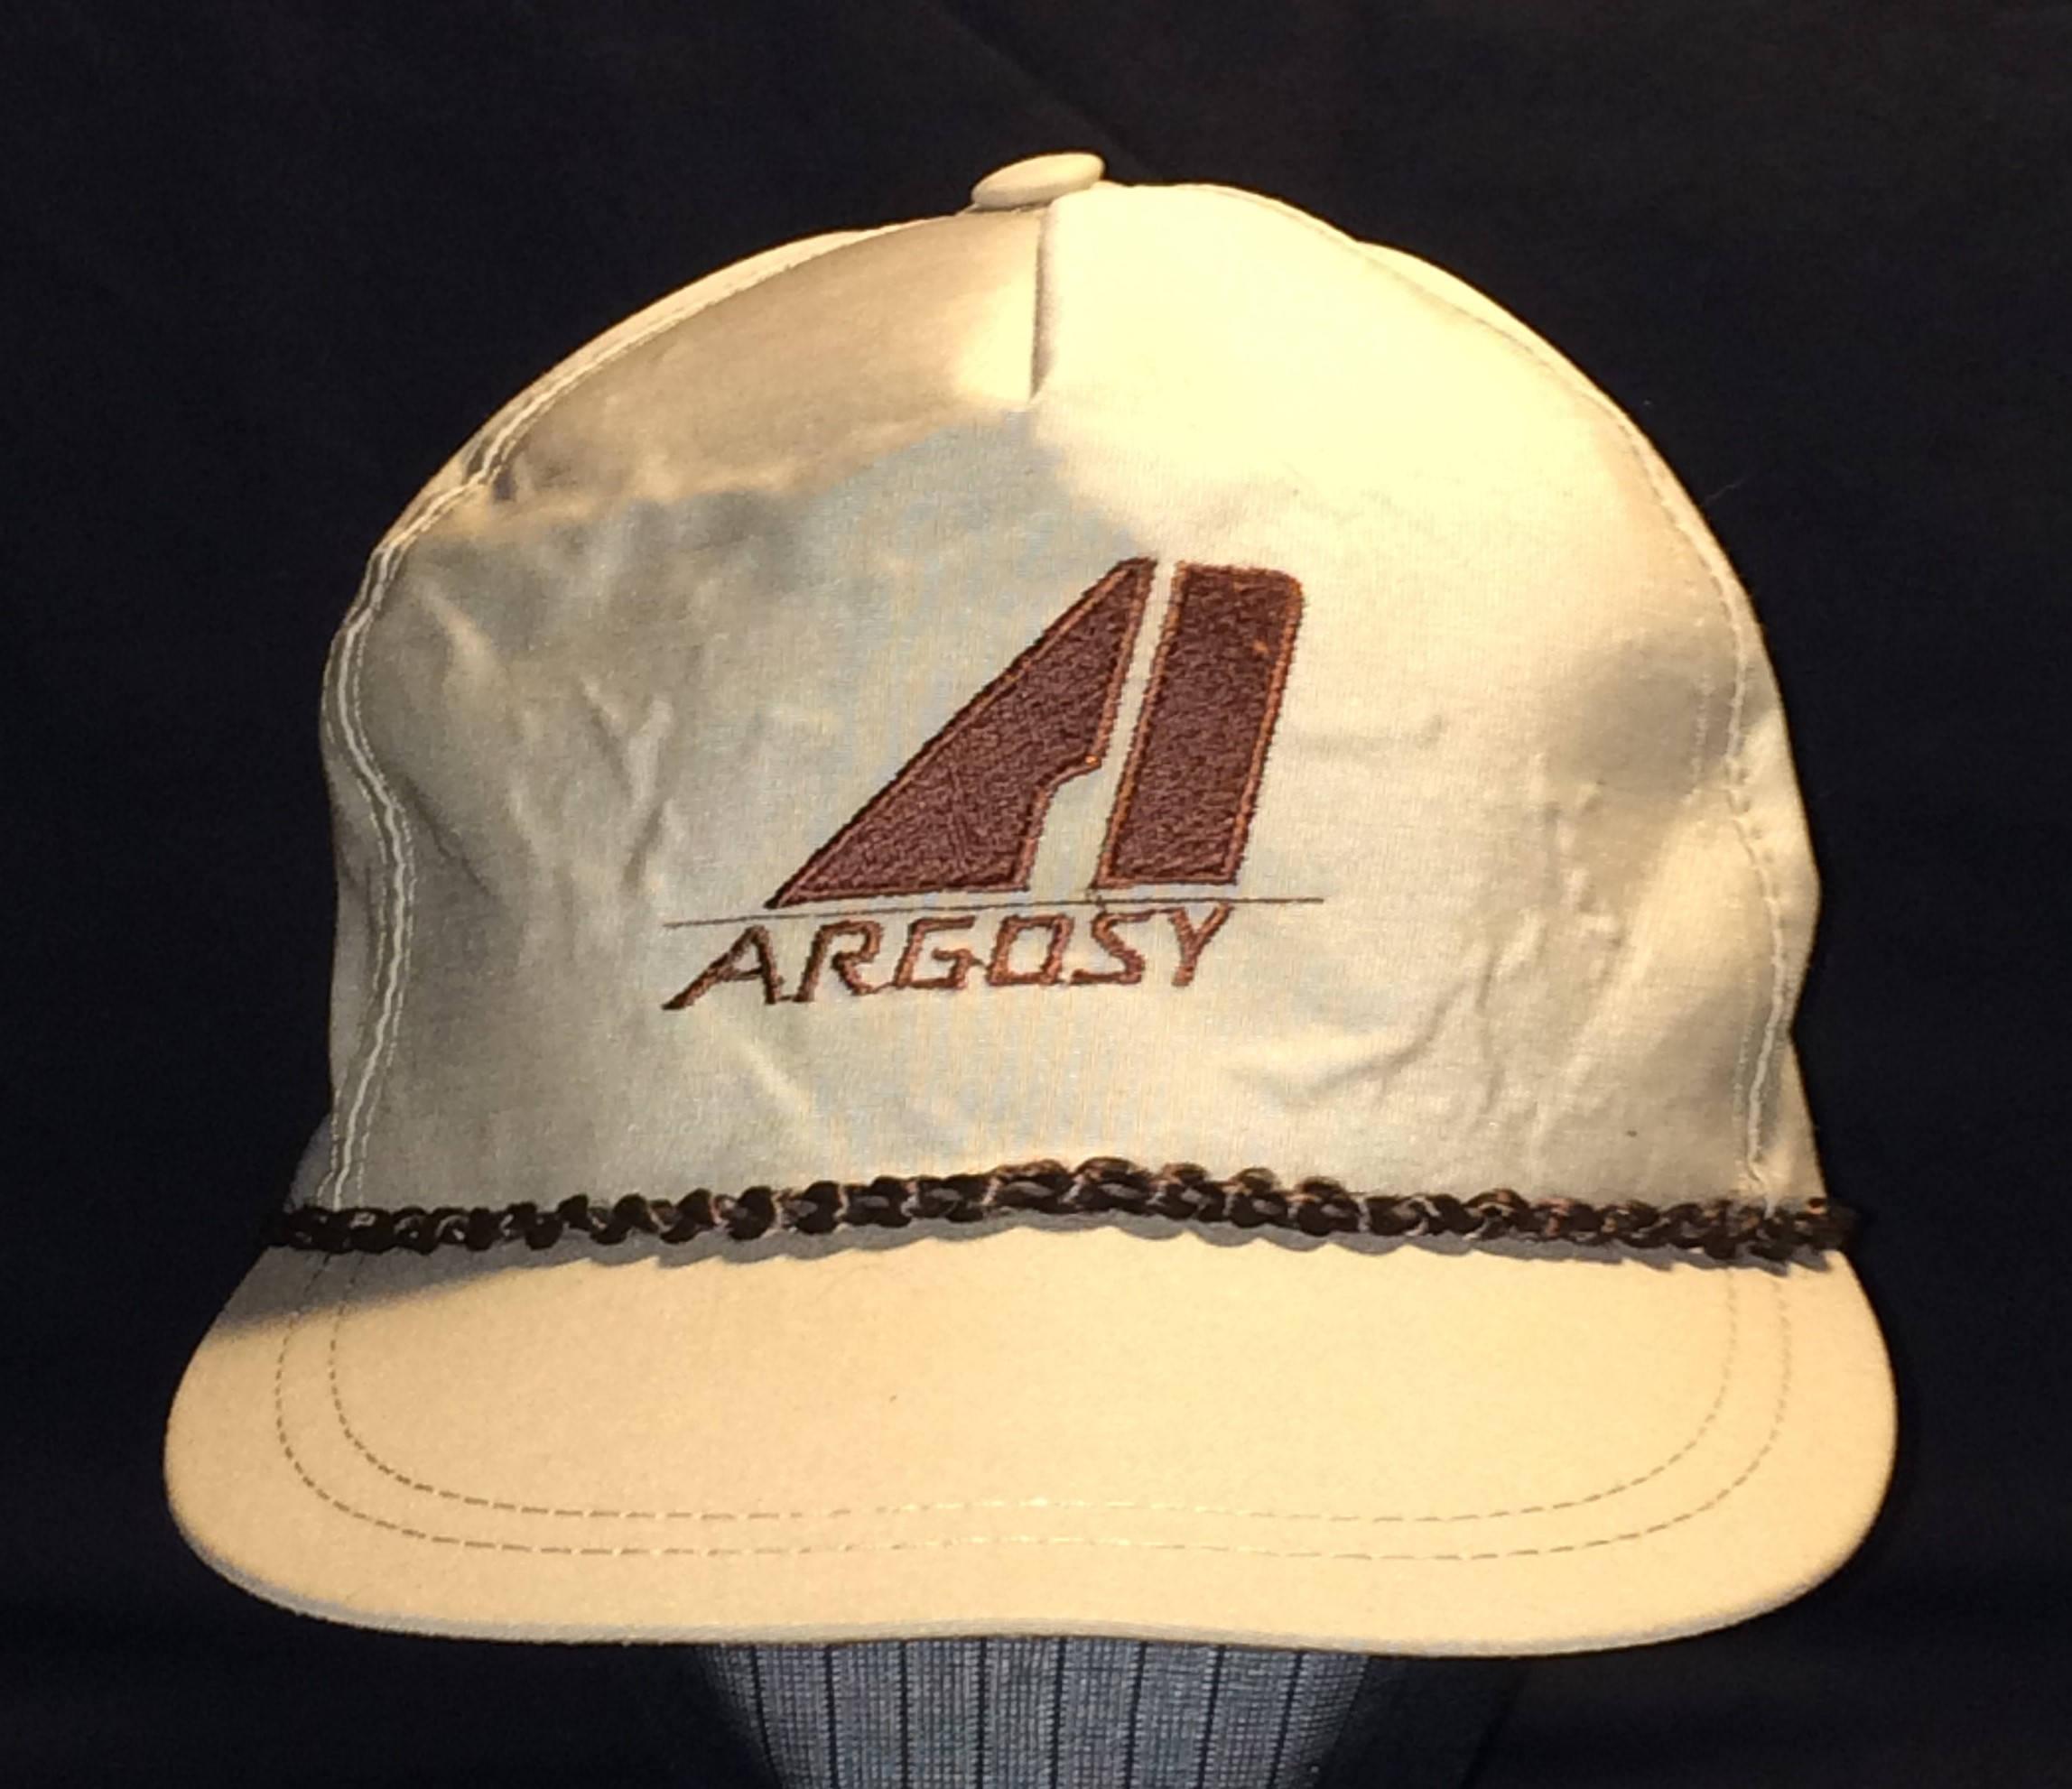 8ac444f4b64 Vintage Hat Baseball Cap Leather Strapback Golf Hat Argosy